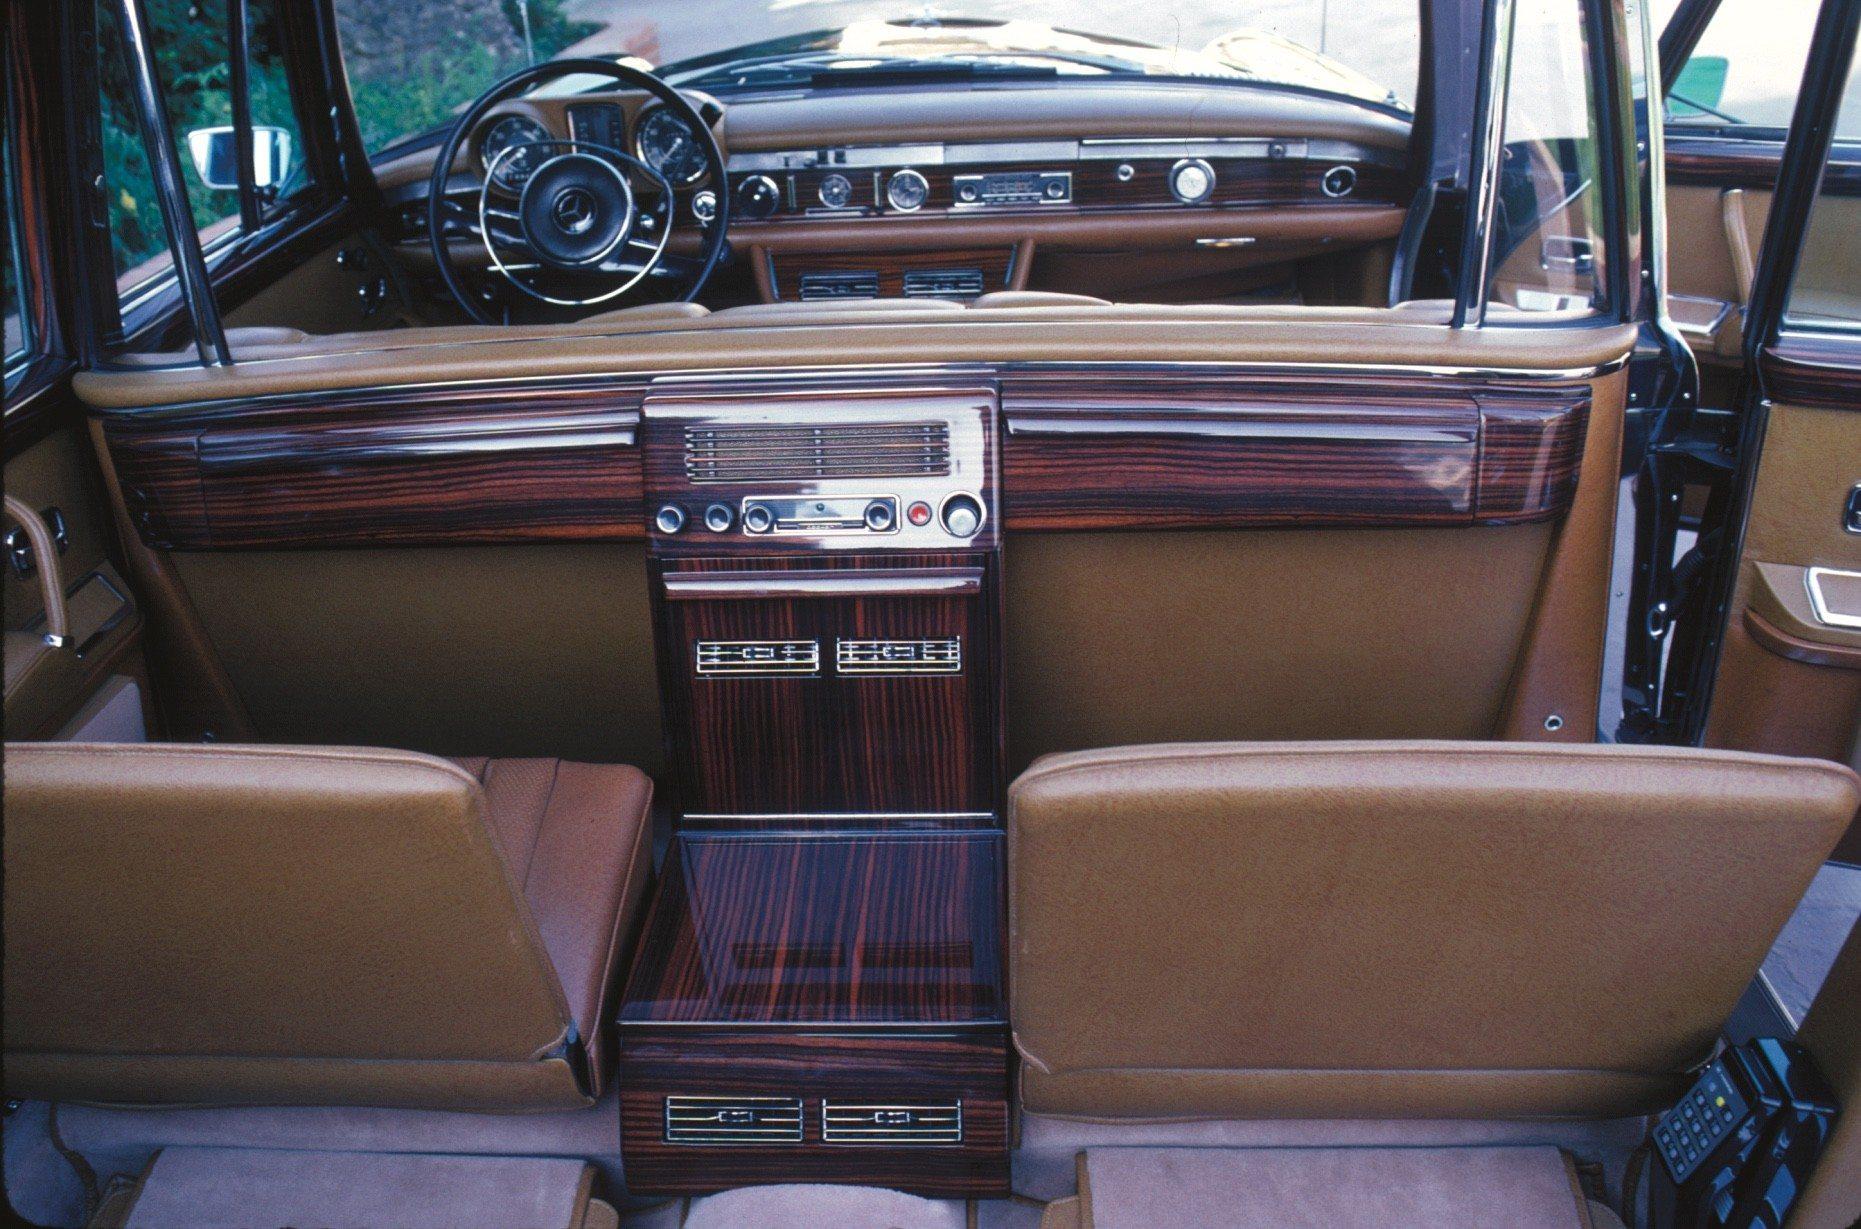 Mercedes-Benz 600 Landaulet Interior